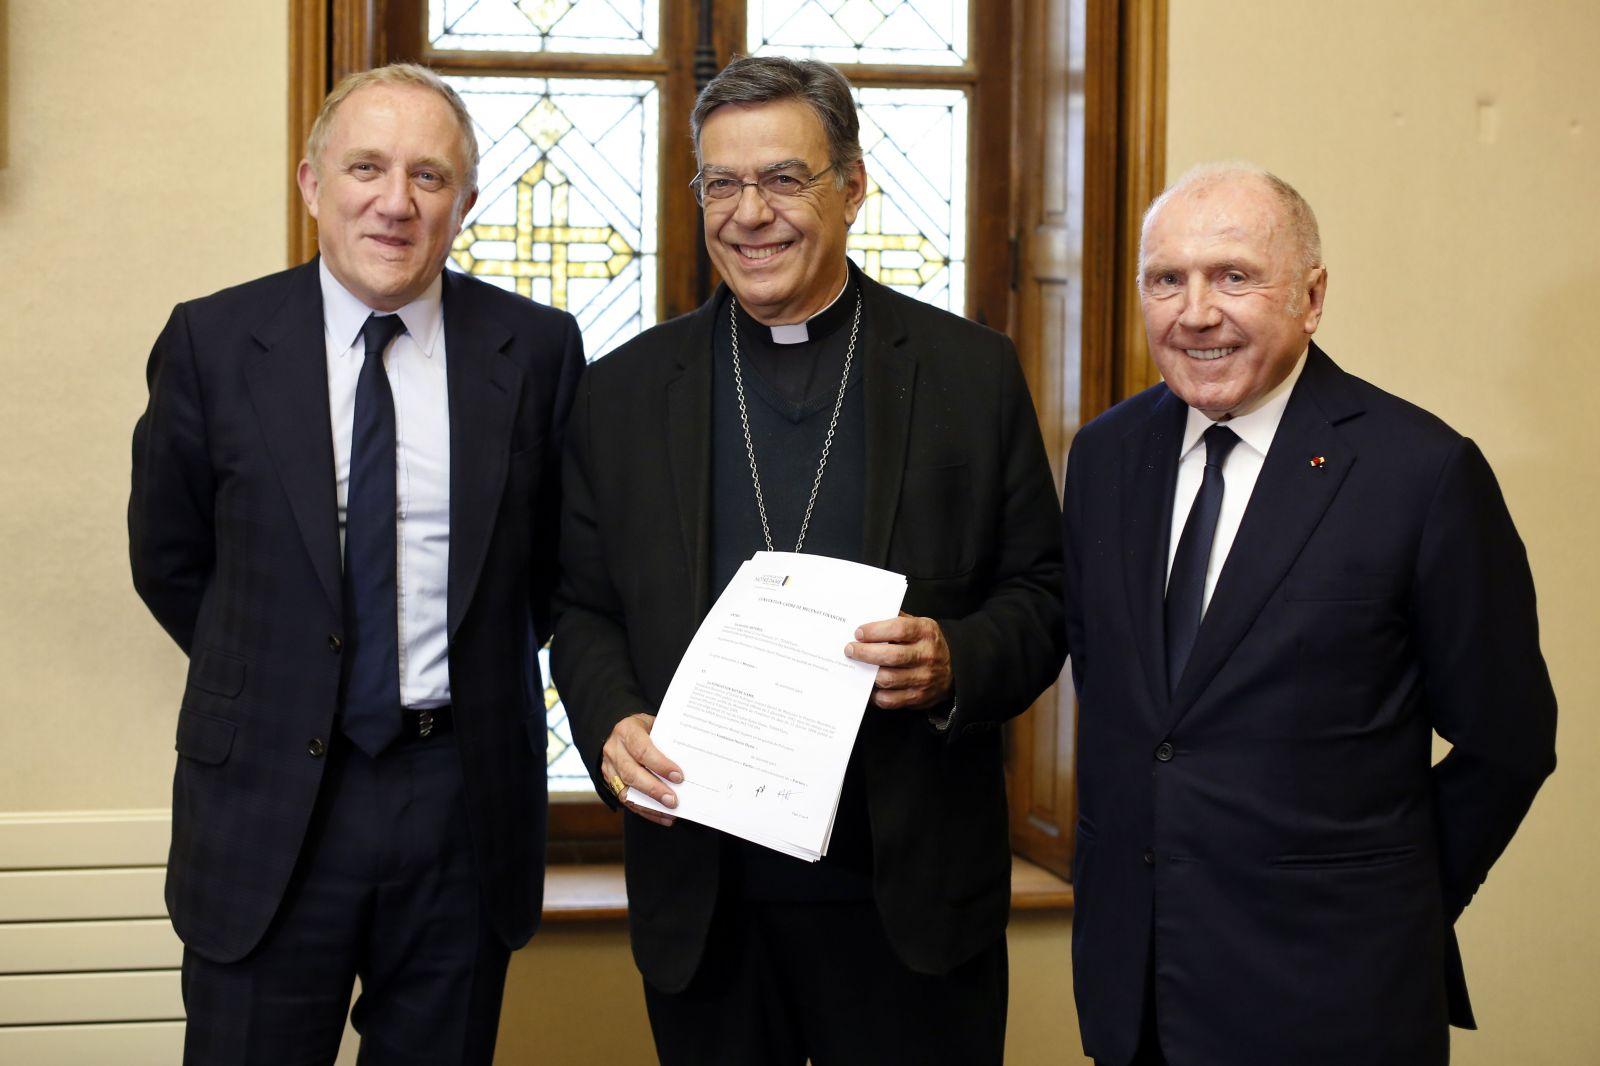 Na Notre Dame darovali 100 miliónov eur. Miliardárska dvojica si splnila svoj sľub